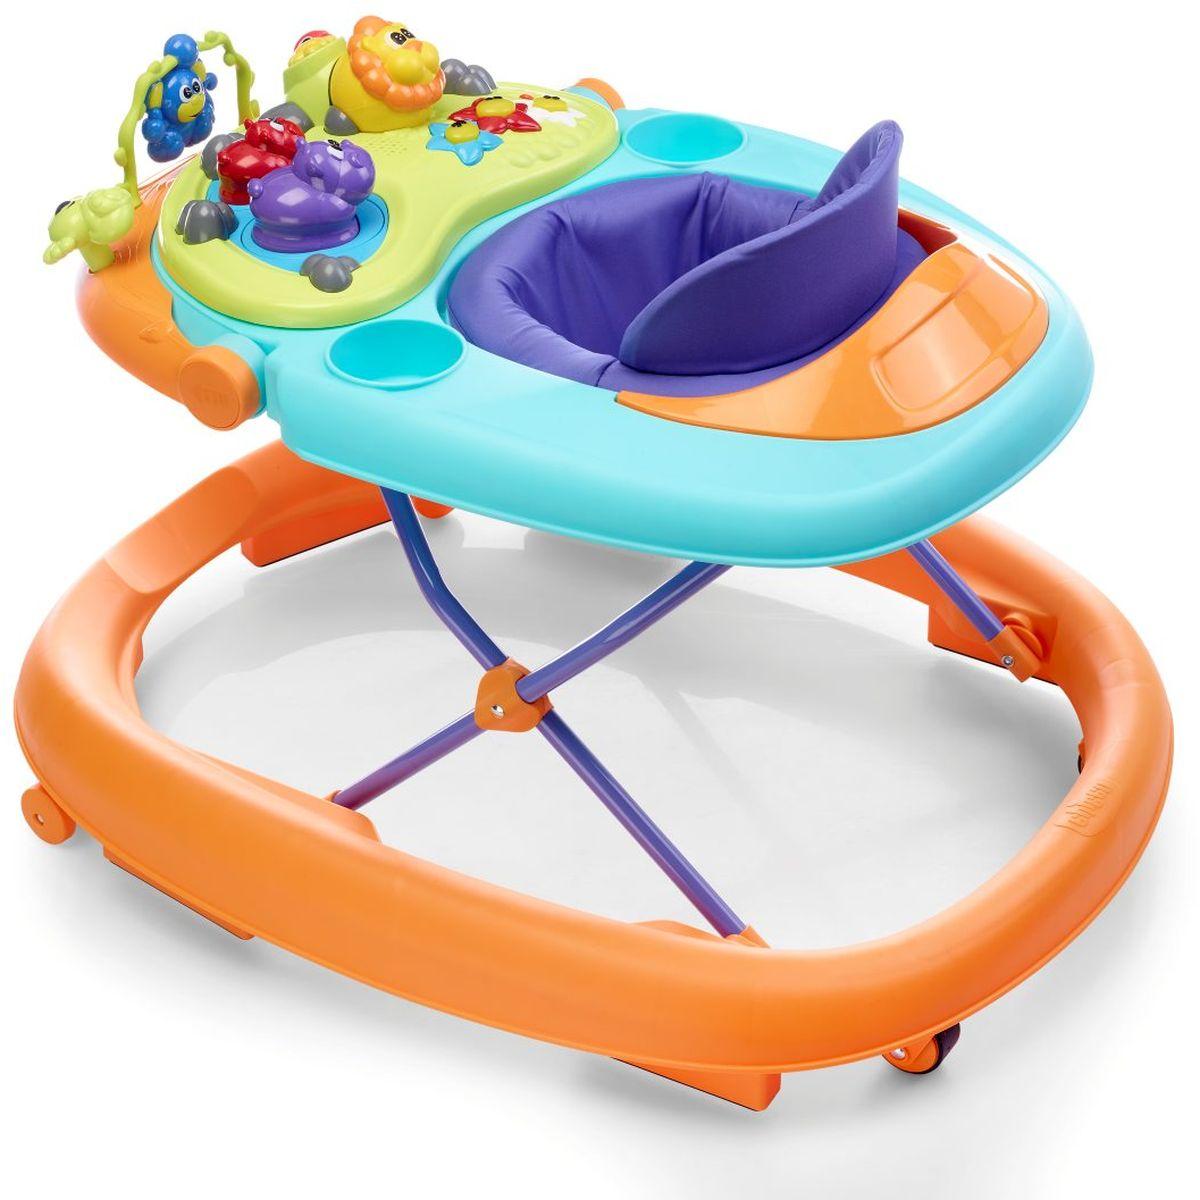 Chicco Ходунки Walky Talky цвет оранжевый держатель ходунки для ребенка other 4034 mothercare